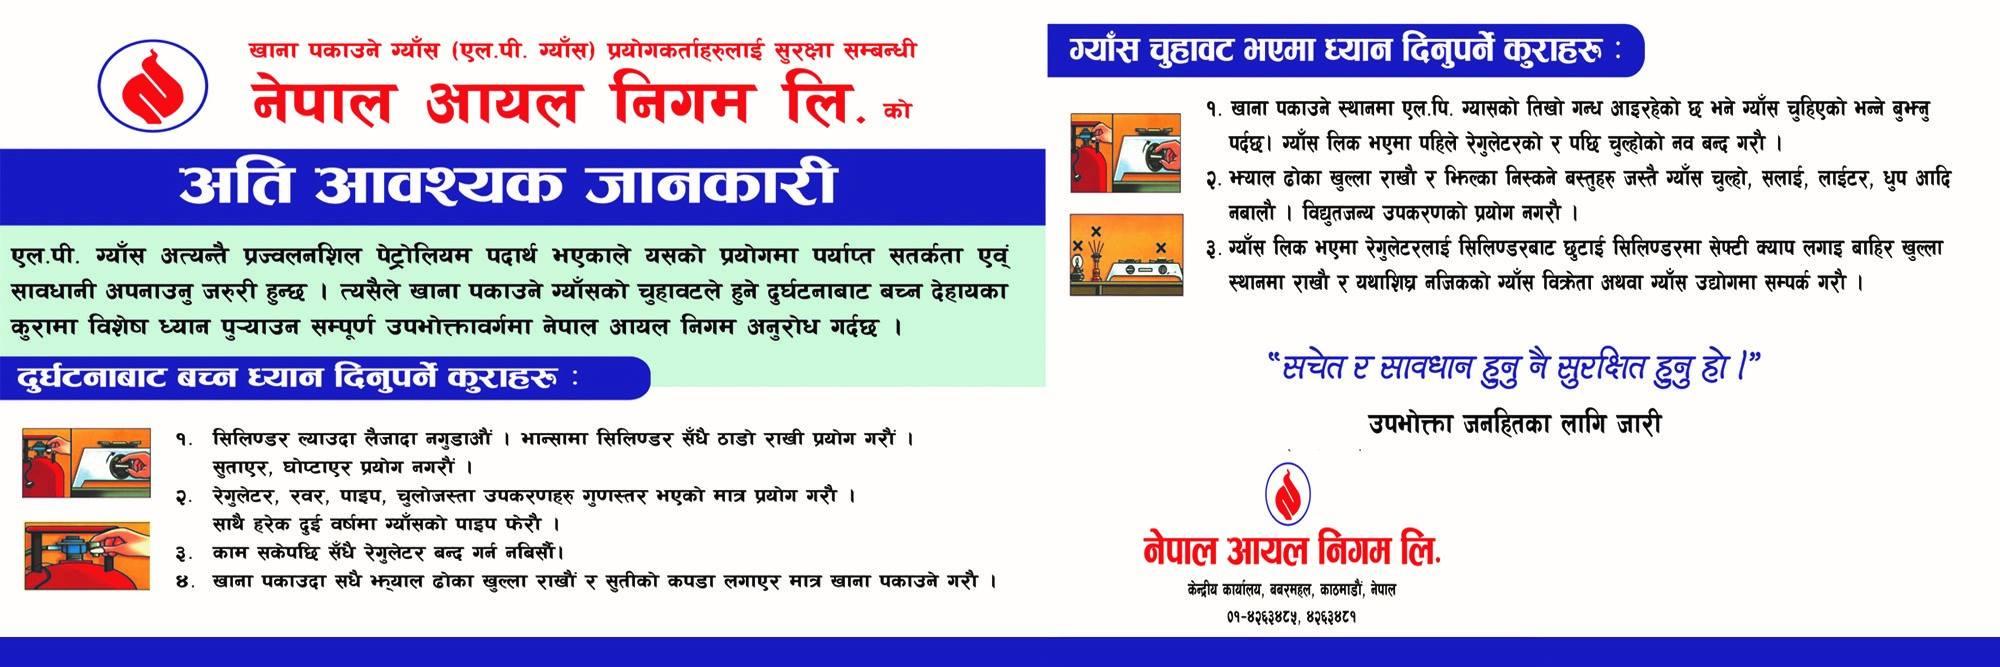 Naya Bikalpa menu advertisement